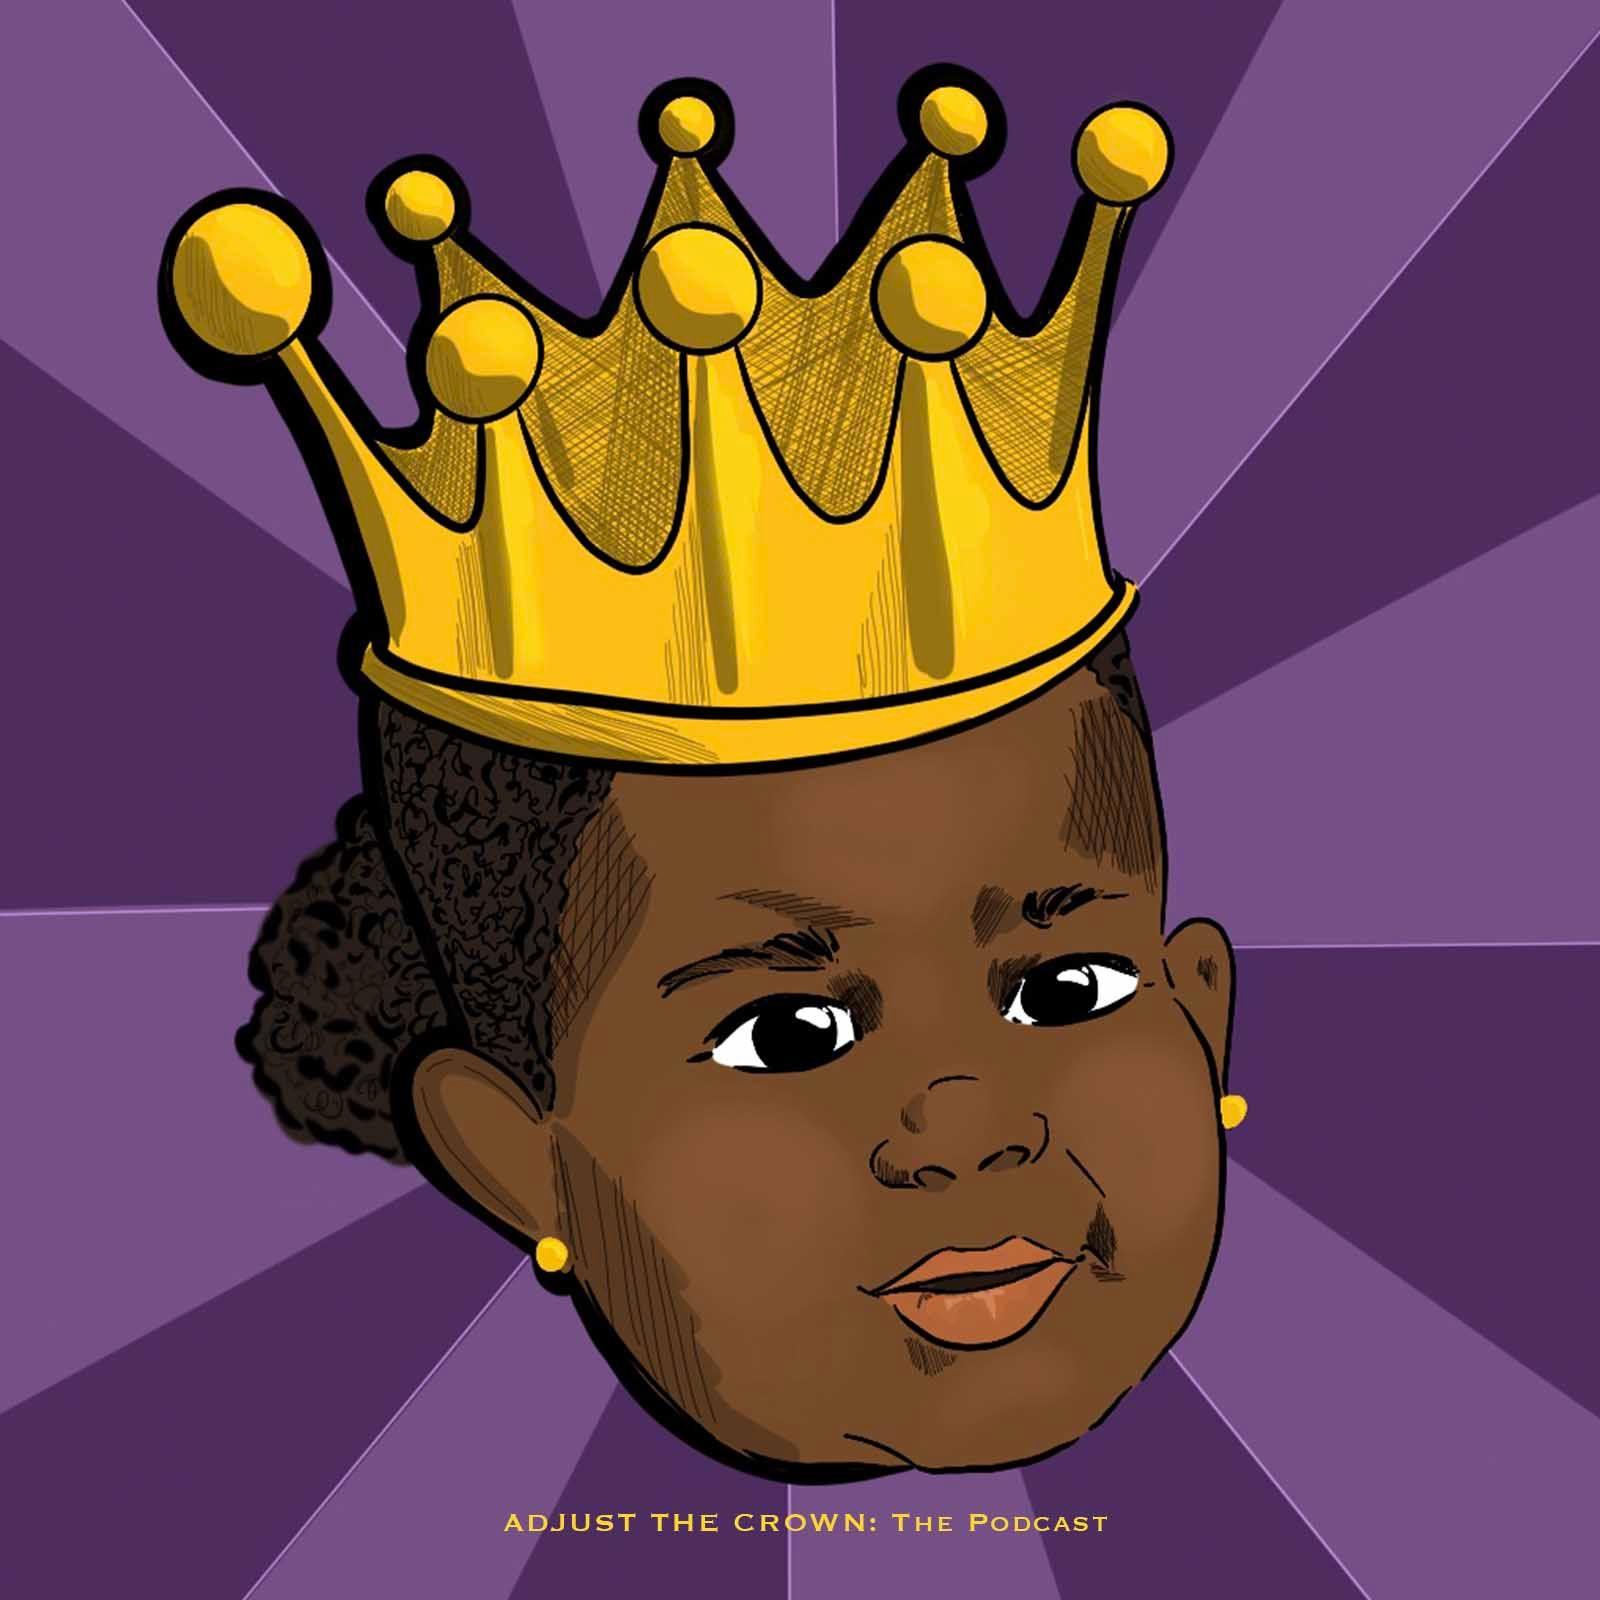 Adjust The Crown Episode 3: Dewayne Perkins